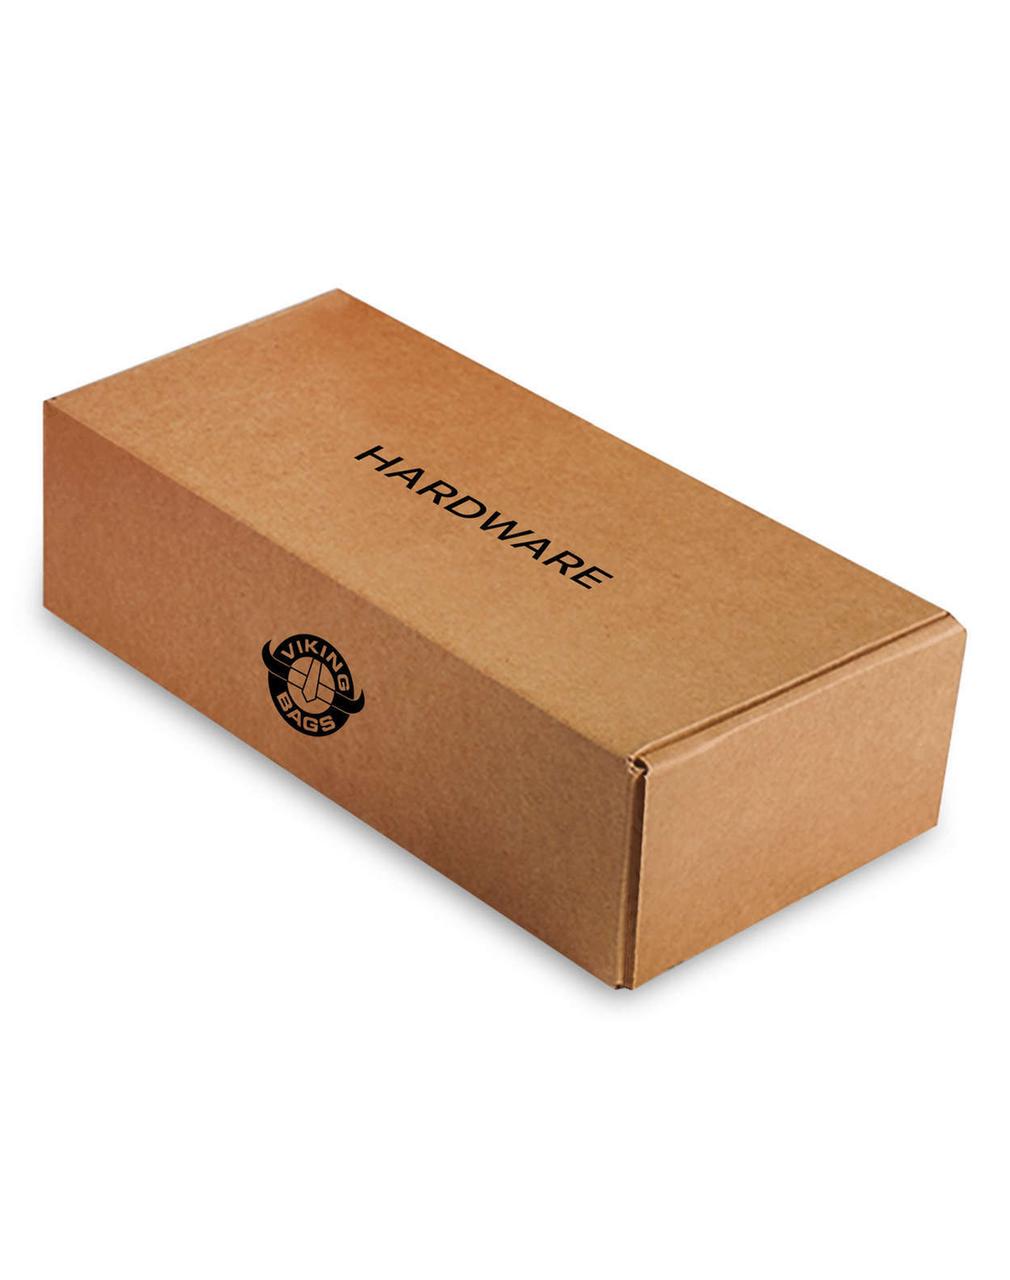 Honda 1100 Shadow Sabre Lamellar Extra Large Shock Cutout Saddlebag box